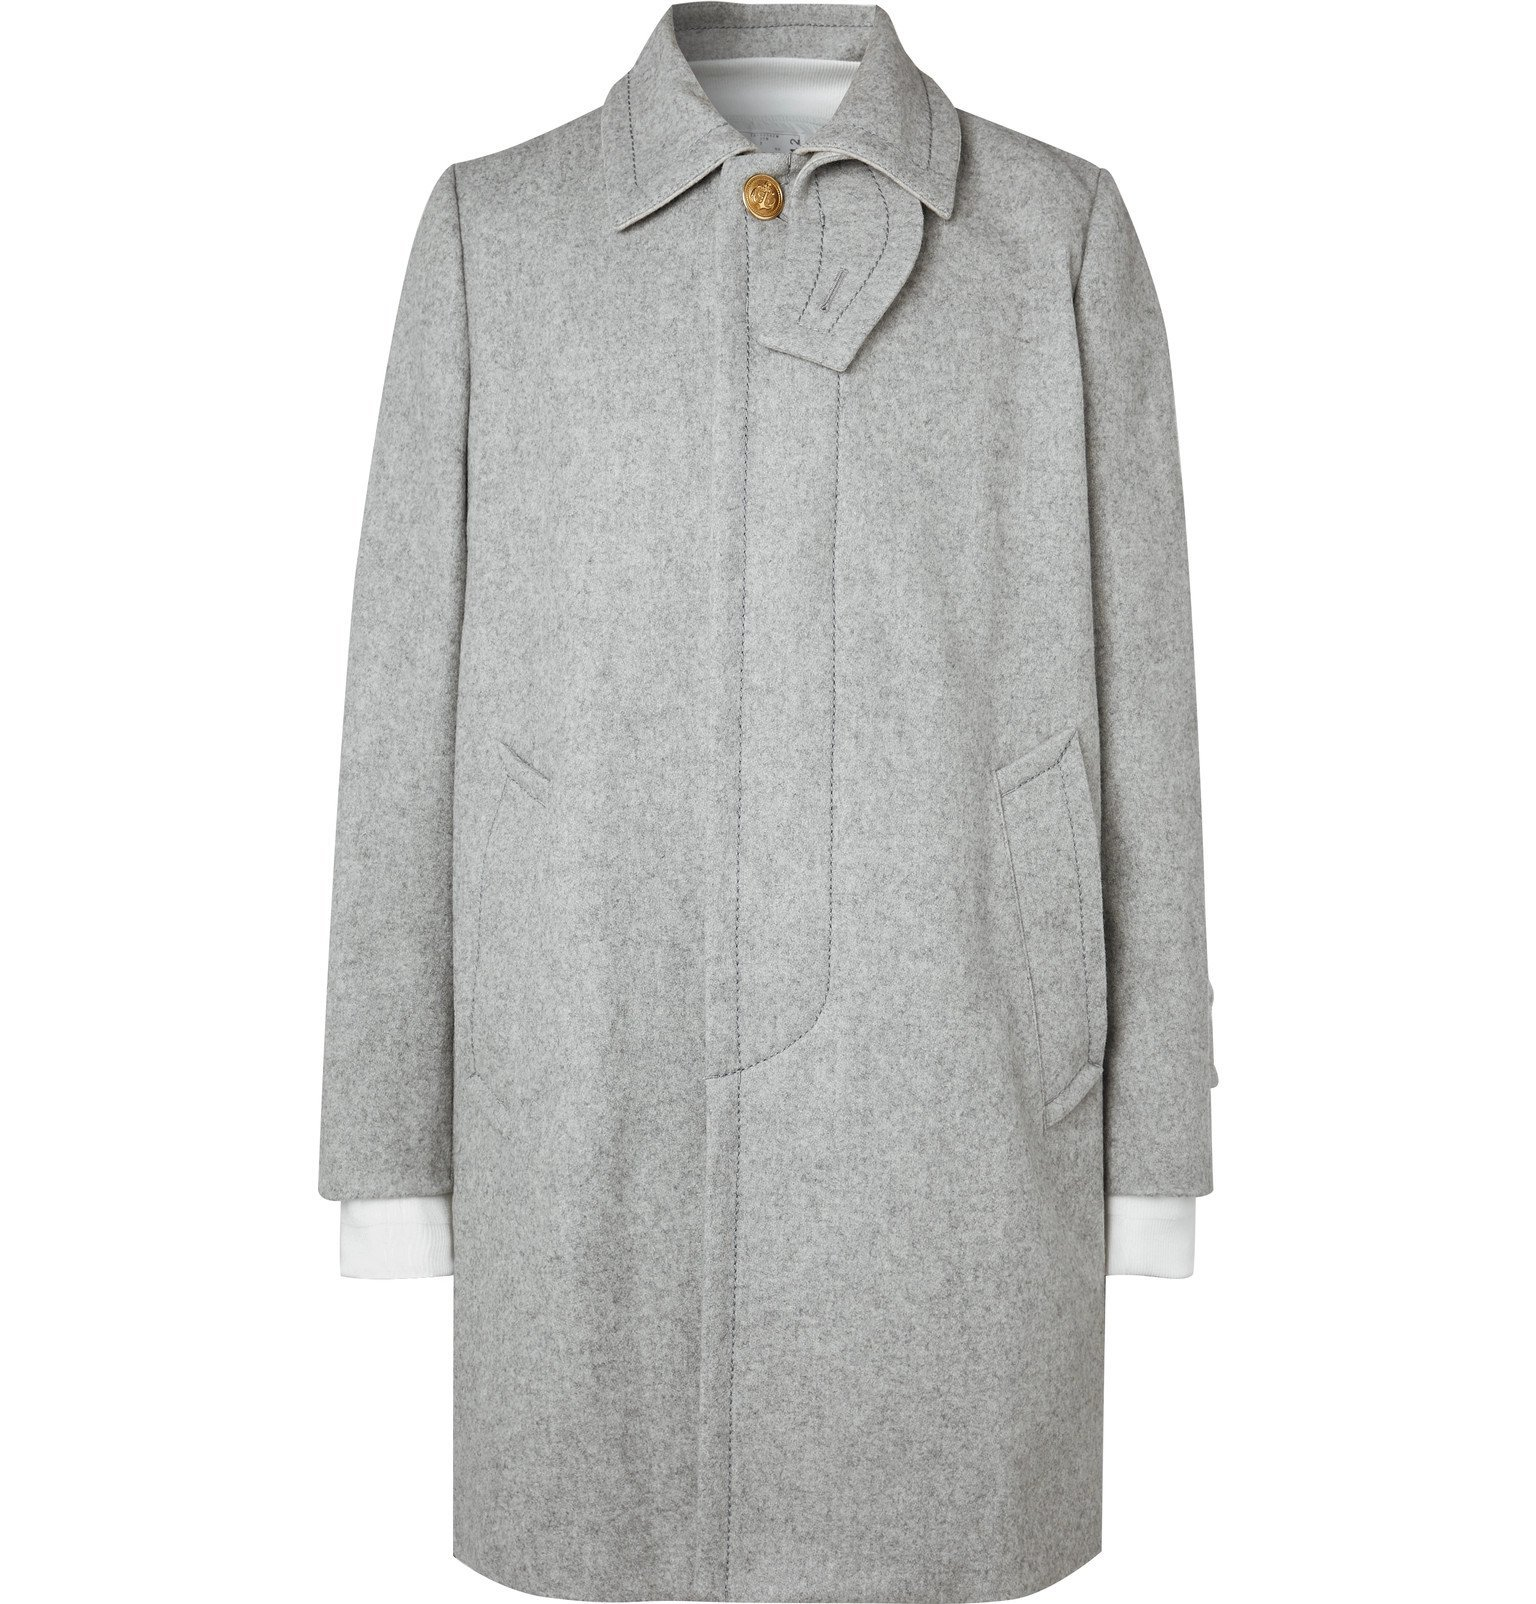 Sacai - Layered Melton Wool-Blend Coat - Gray